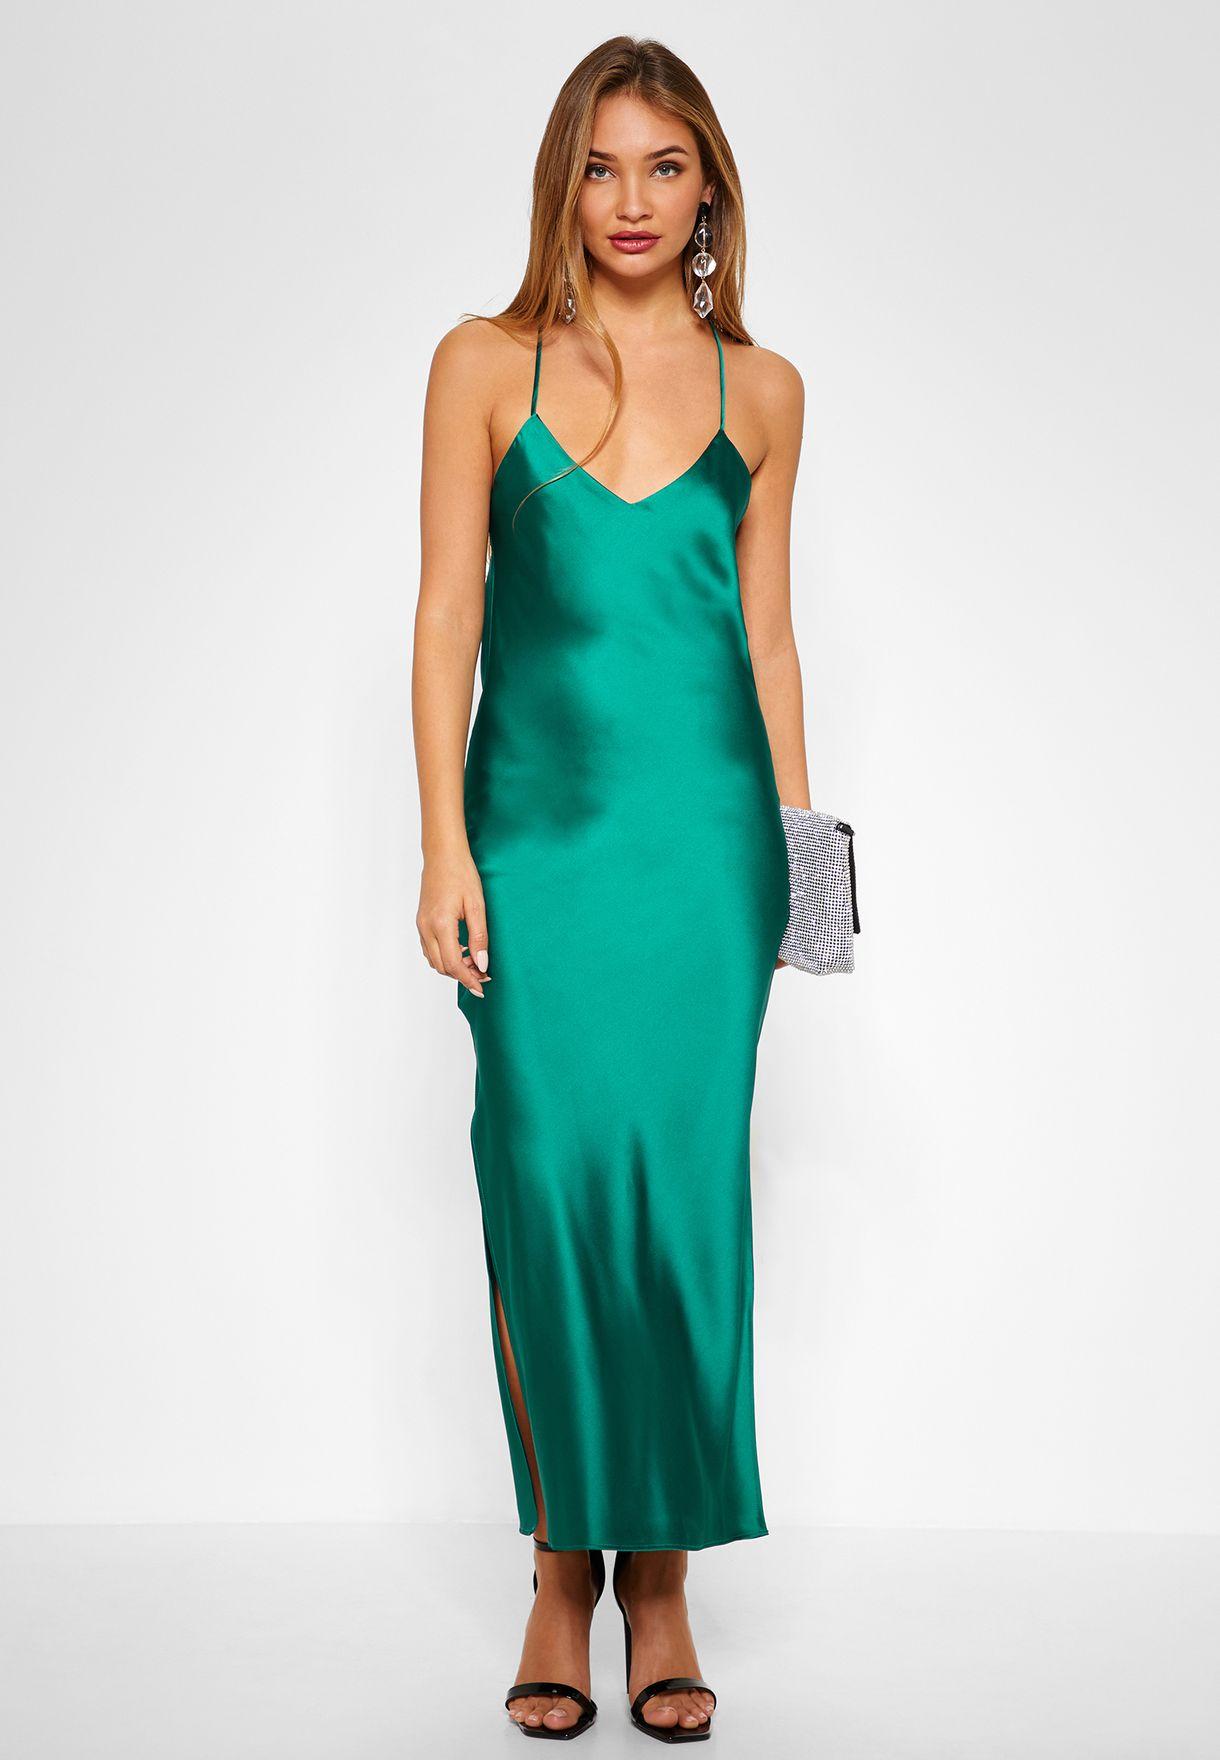 43adc619955 Shop Topshop green Satin Cami Slip Dress 10W02QHGR for Women in UAE ...